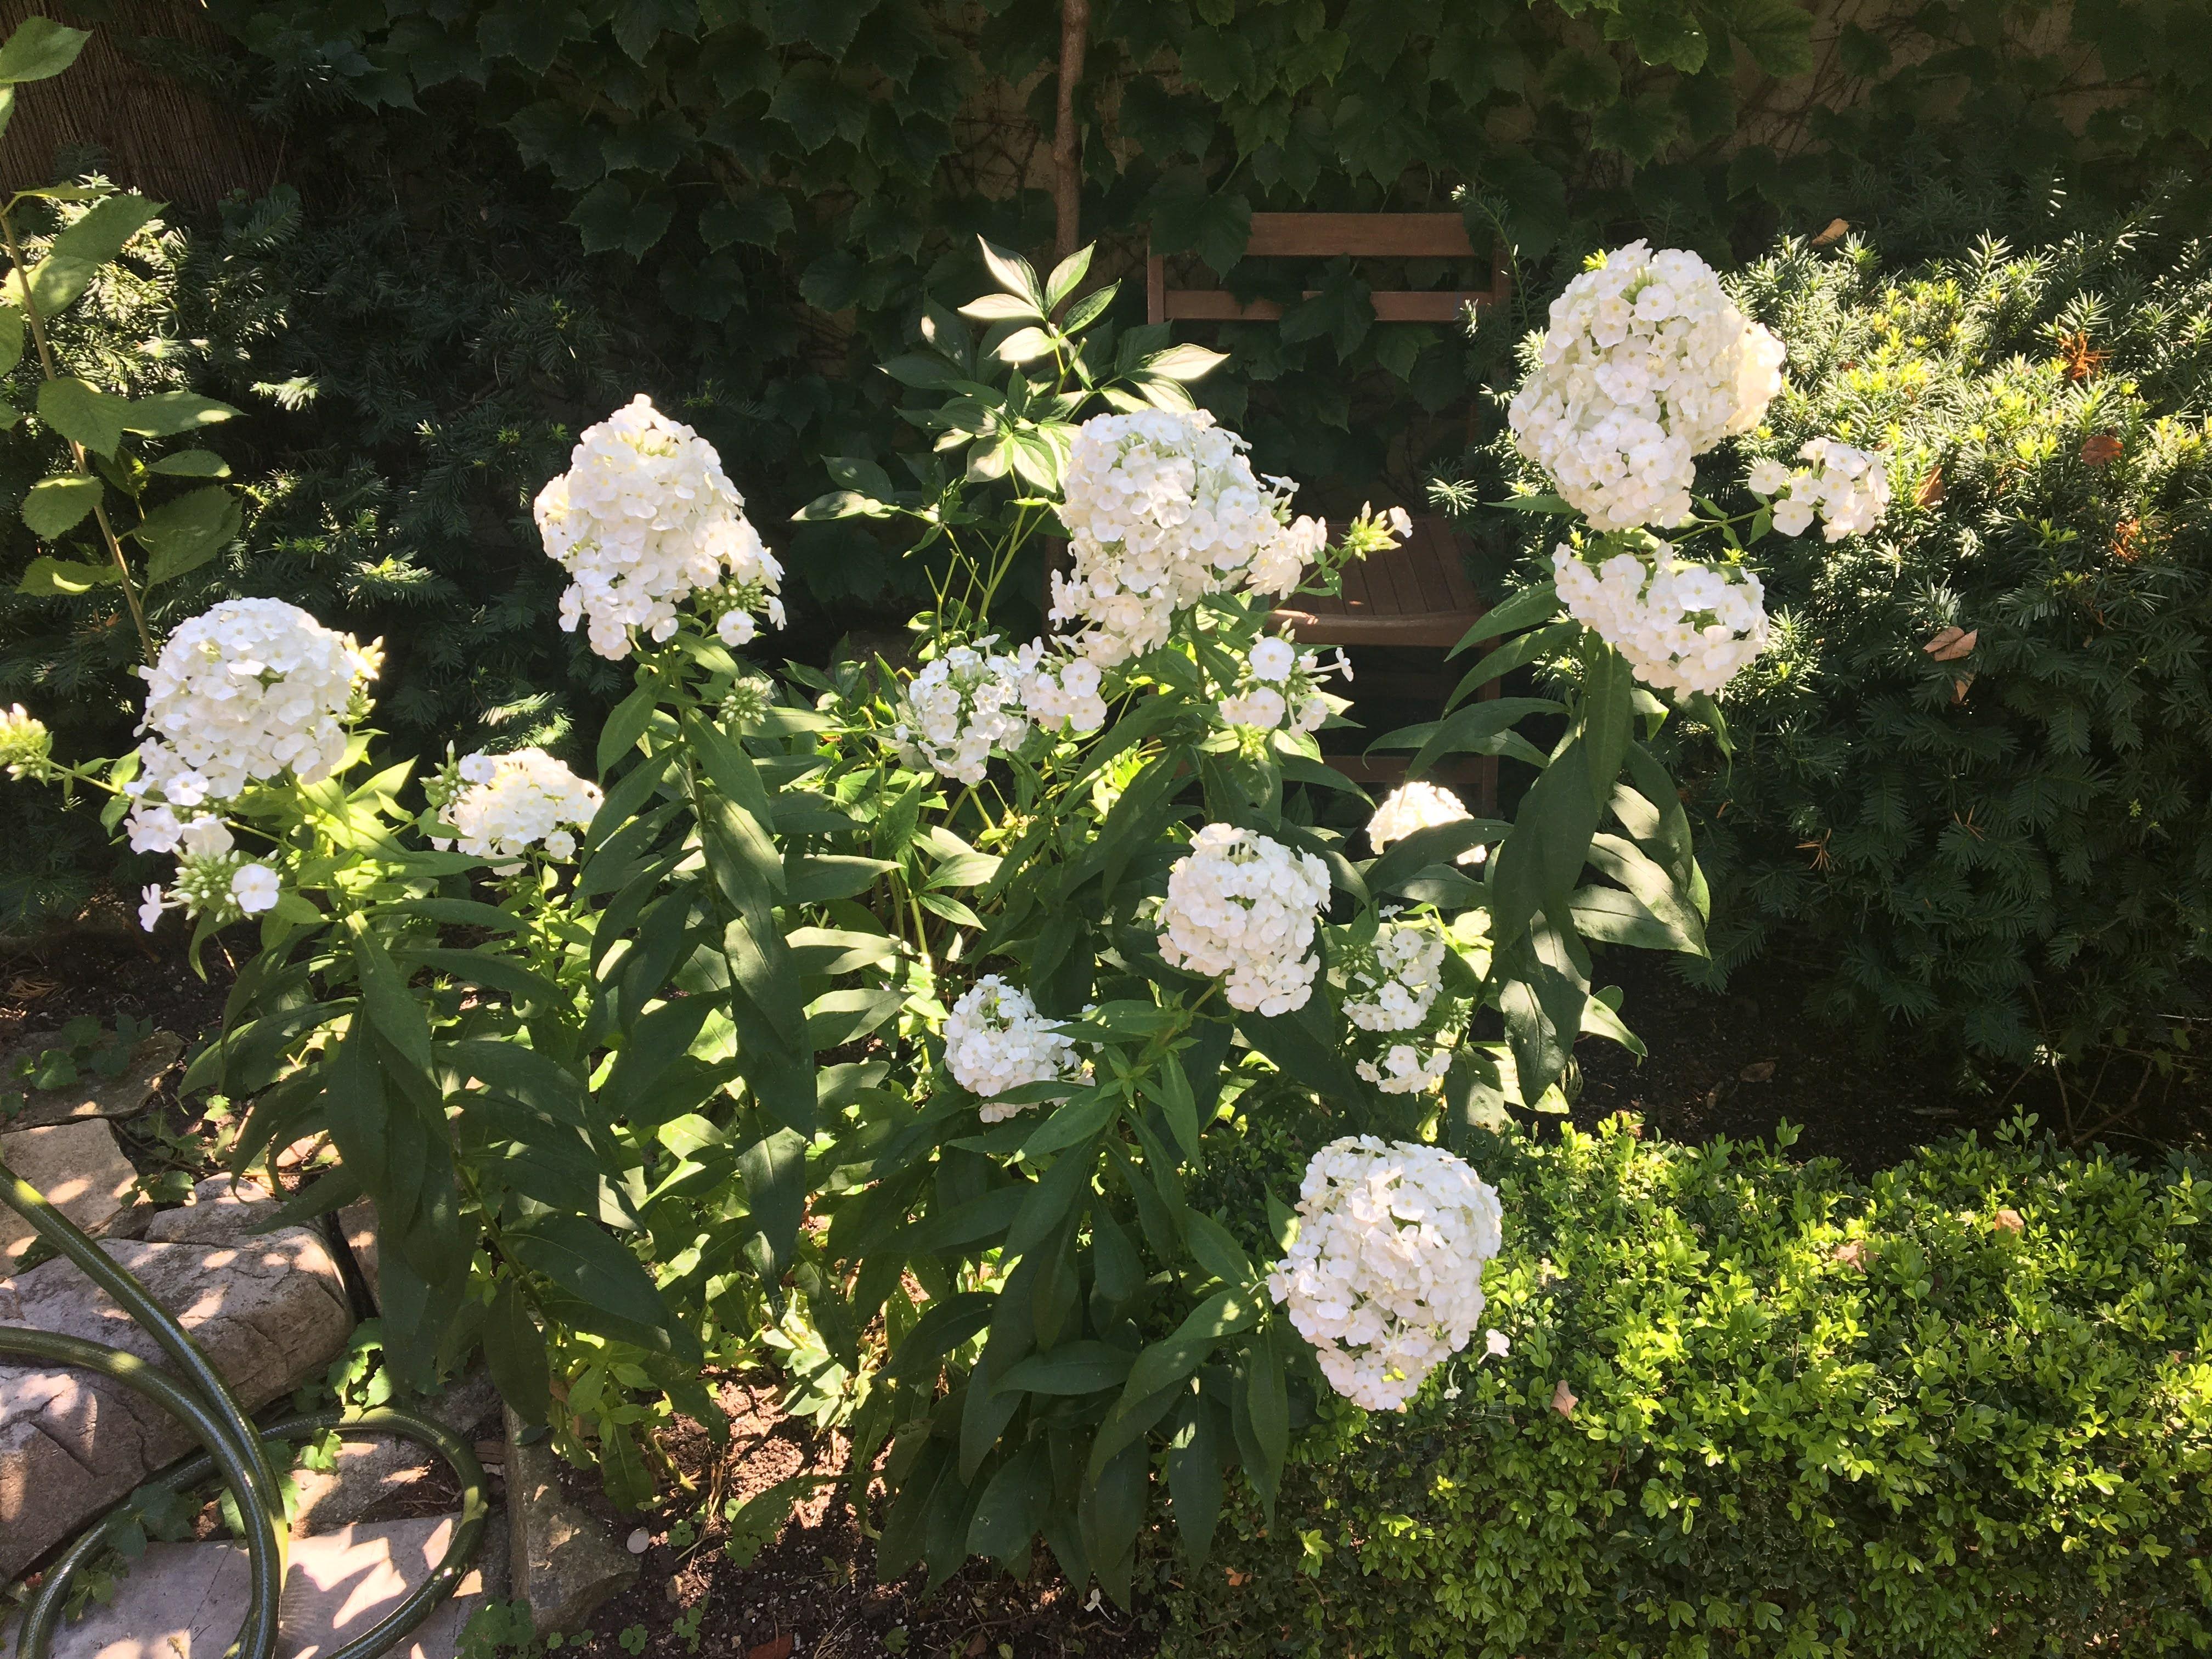 Garden phlox in full bloom